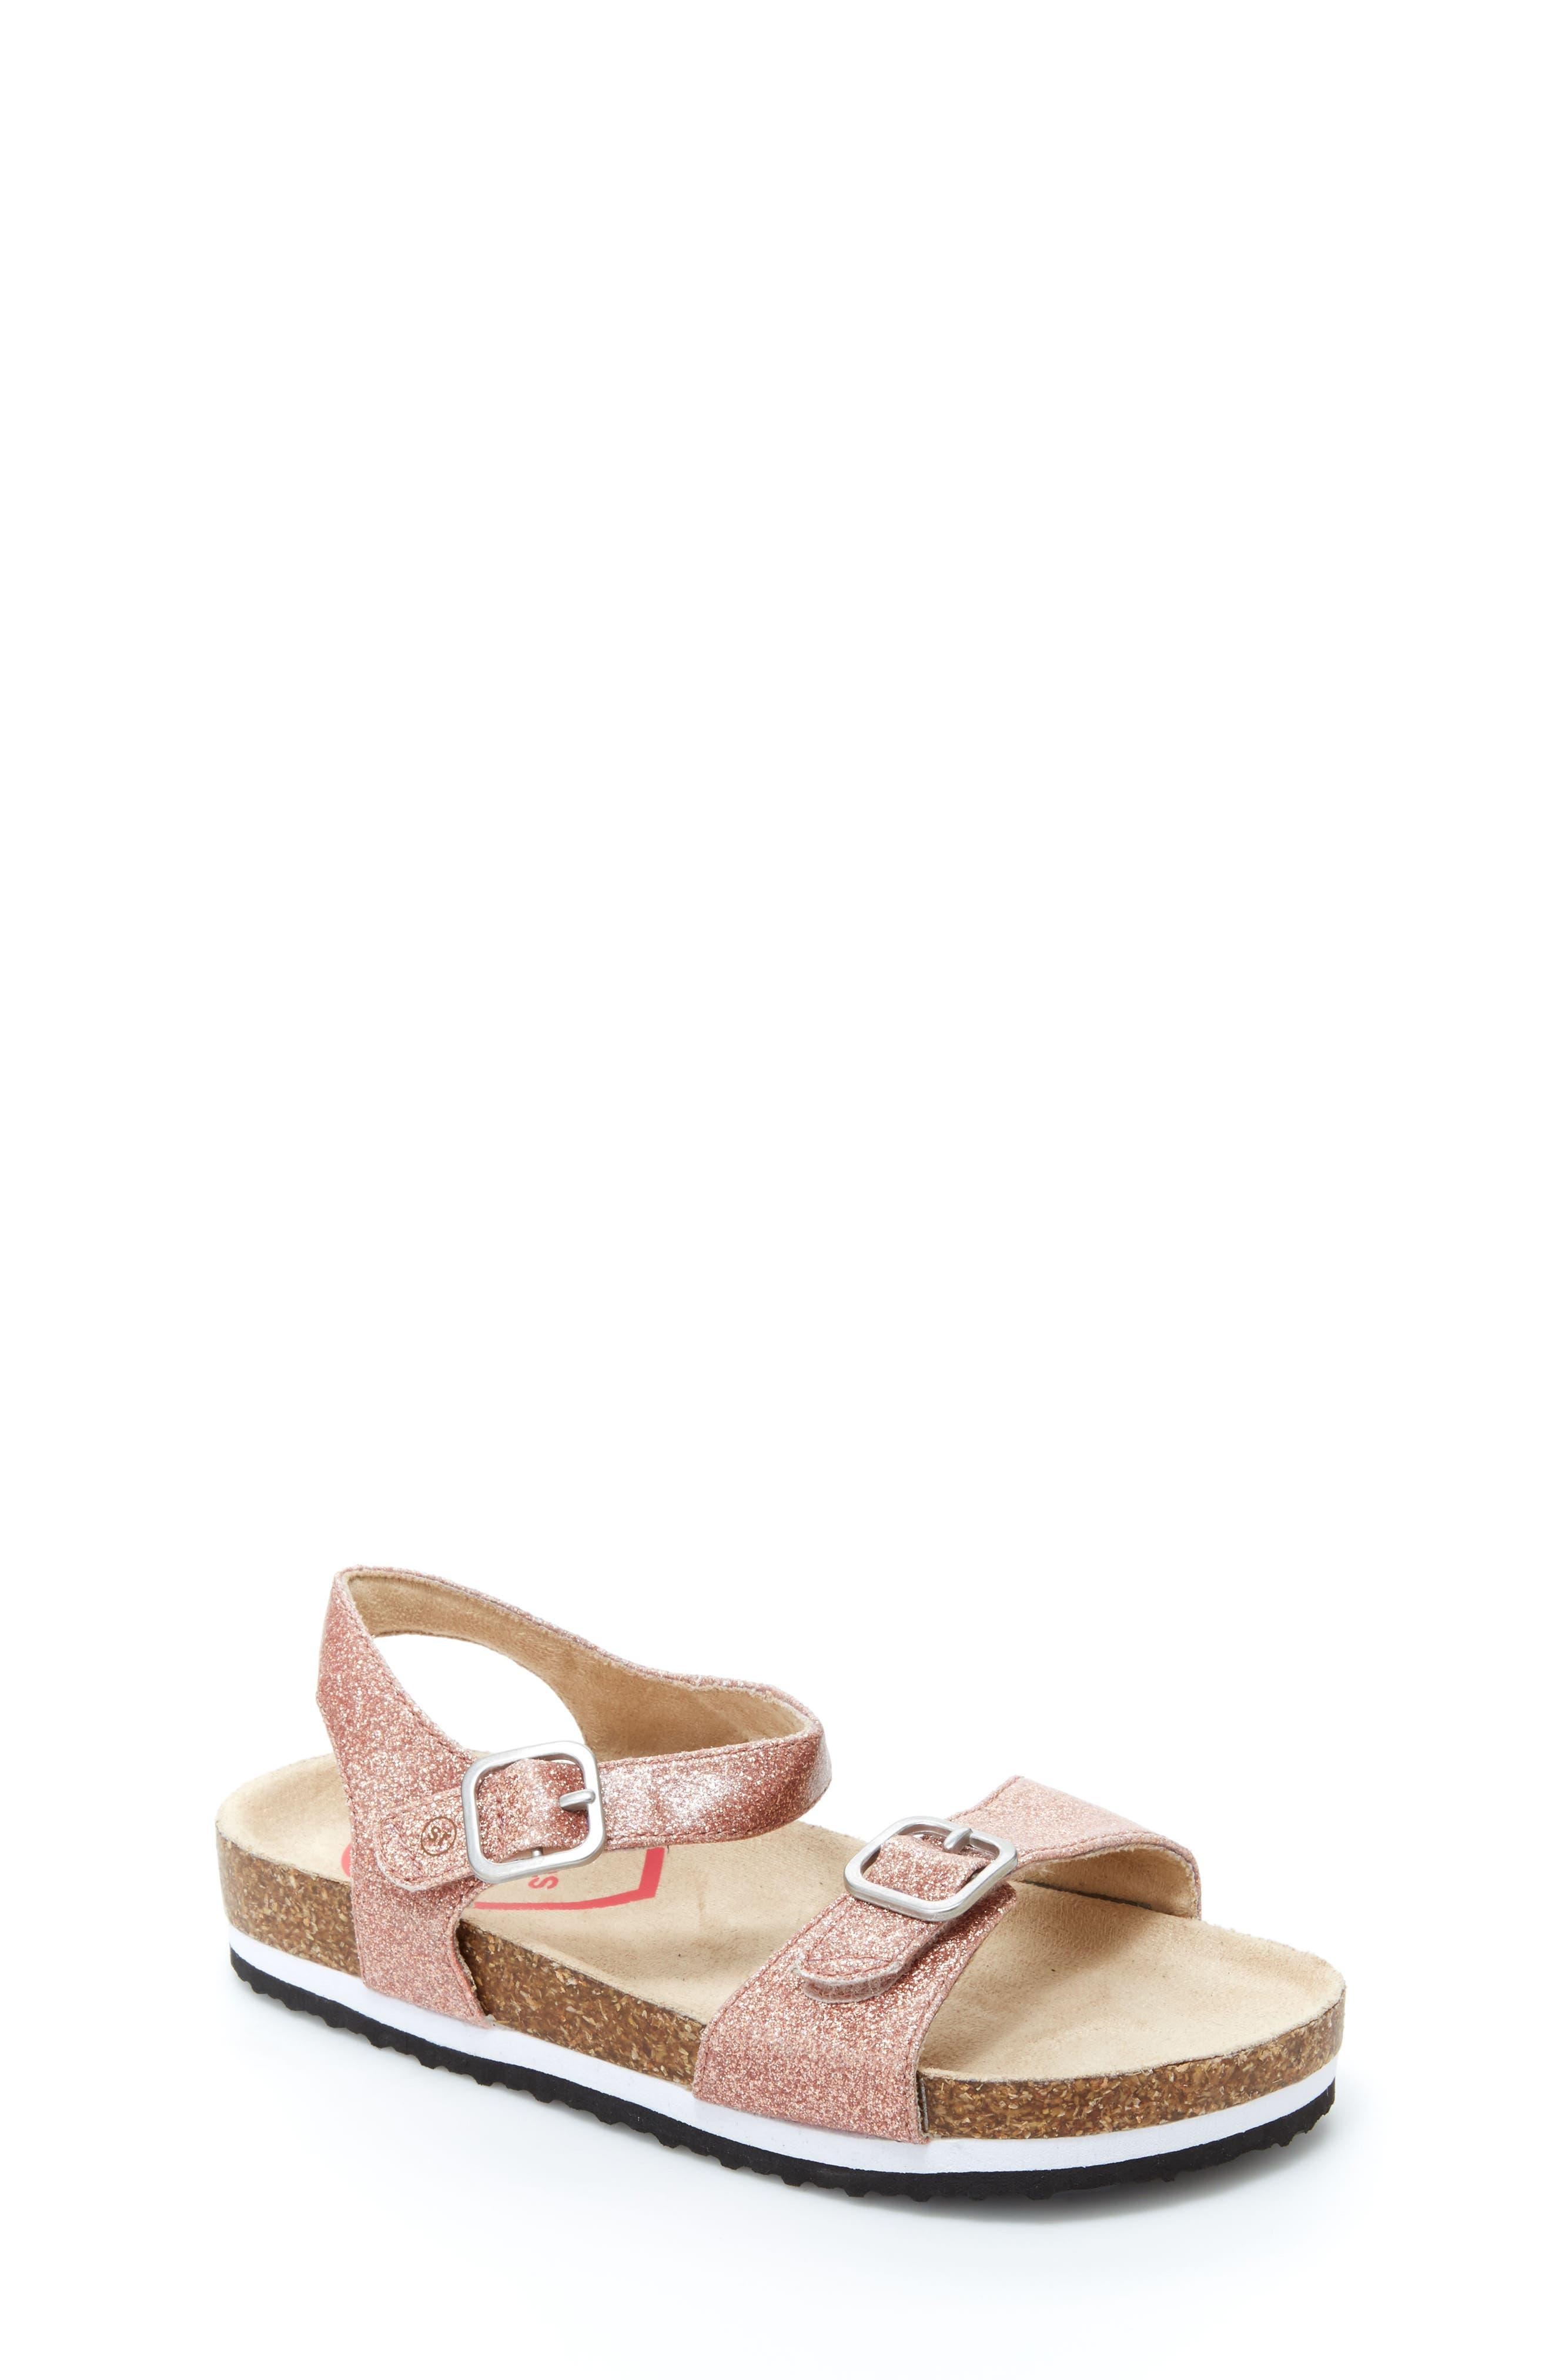 STRIDE RITE Zuly Glitter Sandal, Main, color, ROSE GOLD